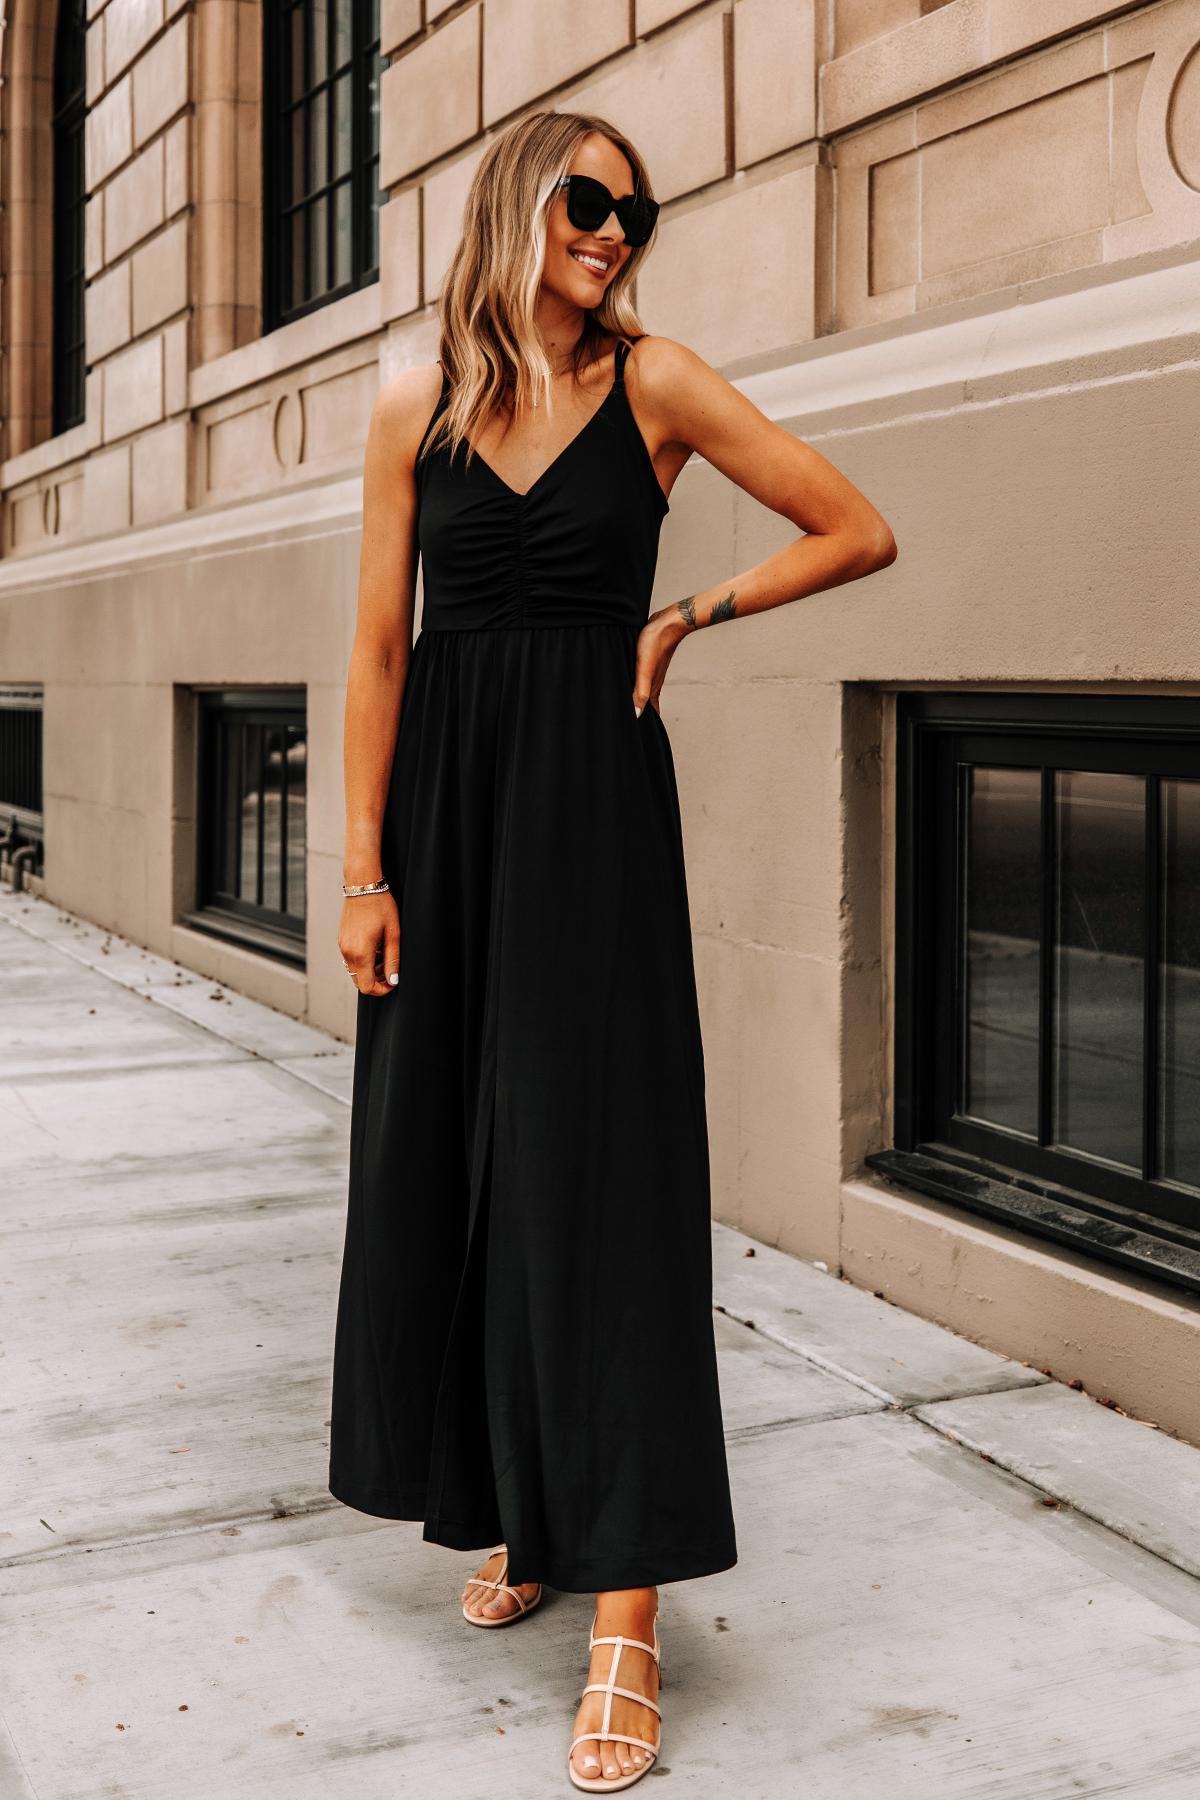 Fashion Jackson Wearing Banana Republic Black Maxi Dress Tan Sandals